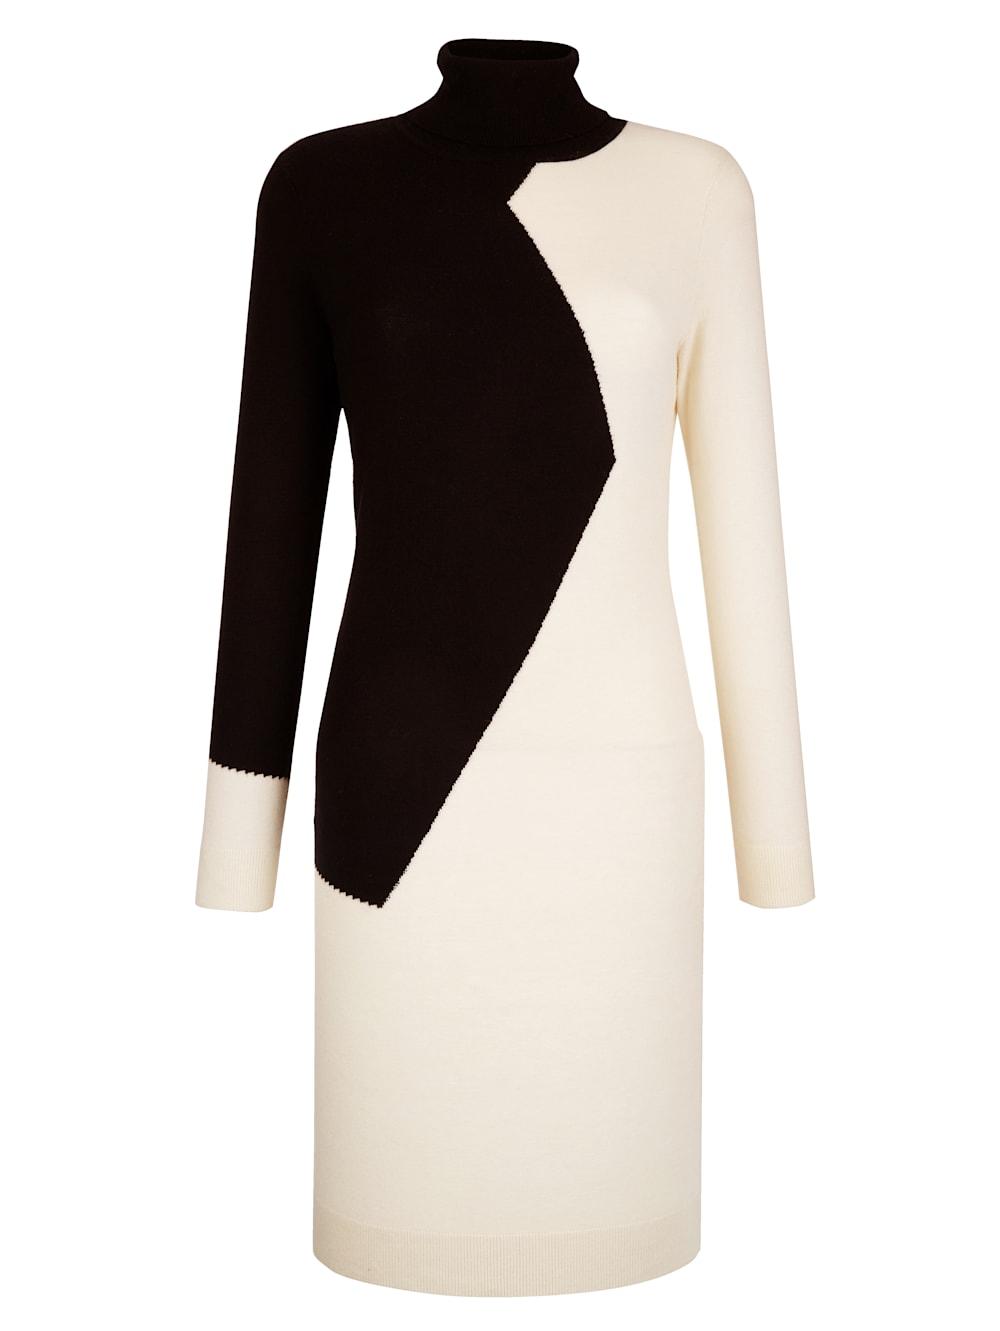 alba moda kleid im patch-look | alba moda